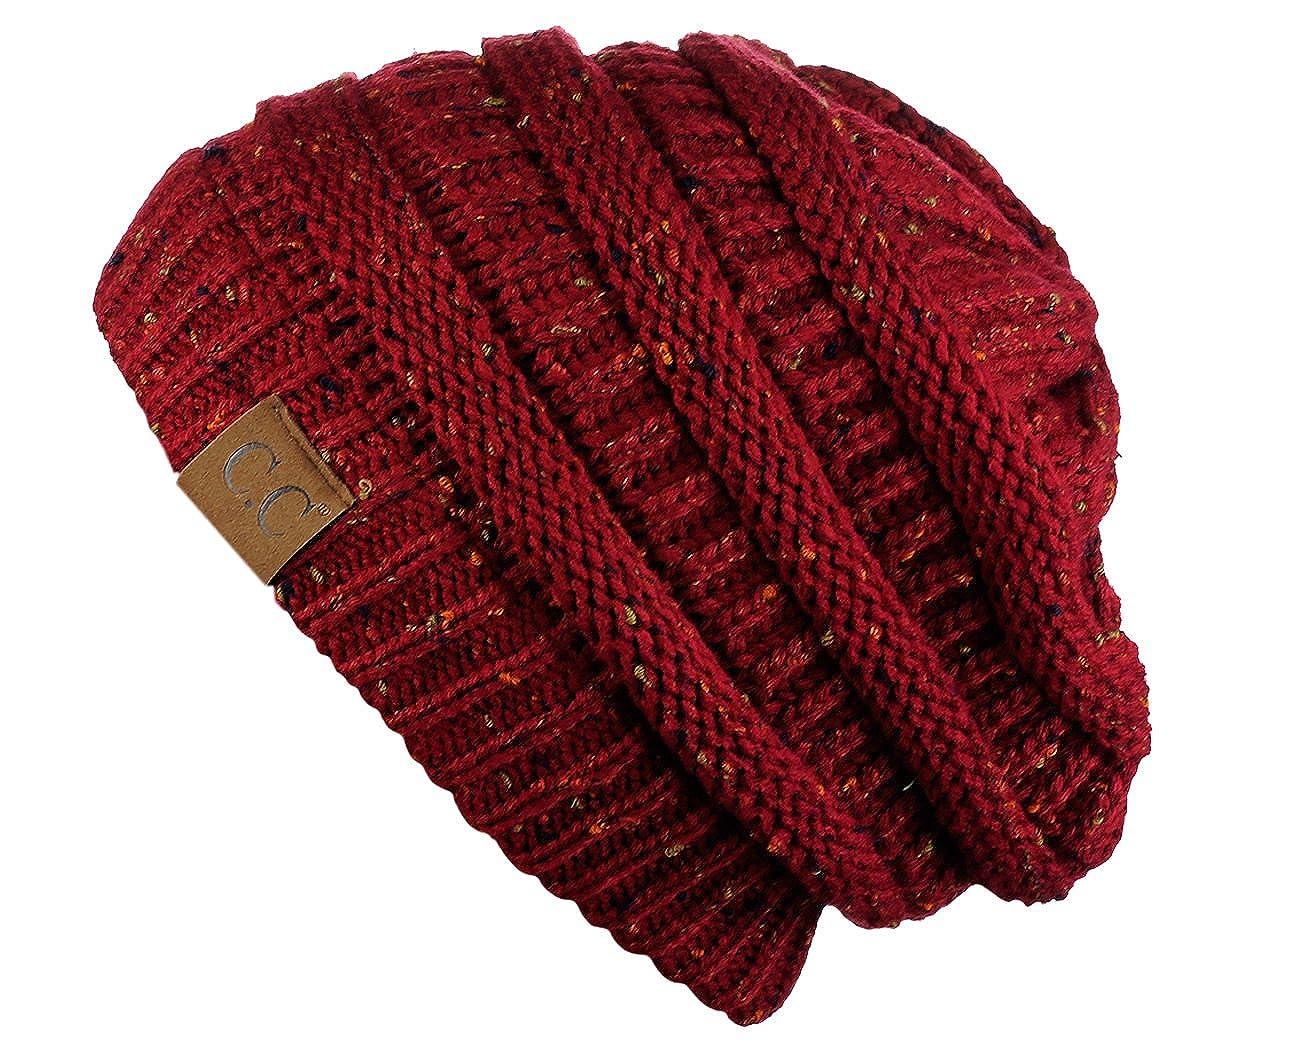 3438ce5cc8f24 C.C Unisex Colorful Confetti Soft Stretch Cable Knit Beanie  Skullcap-Burgundy